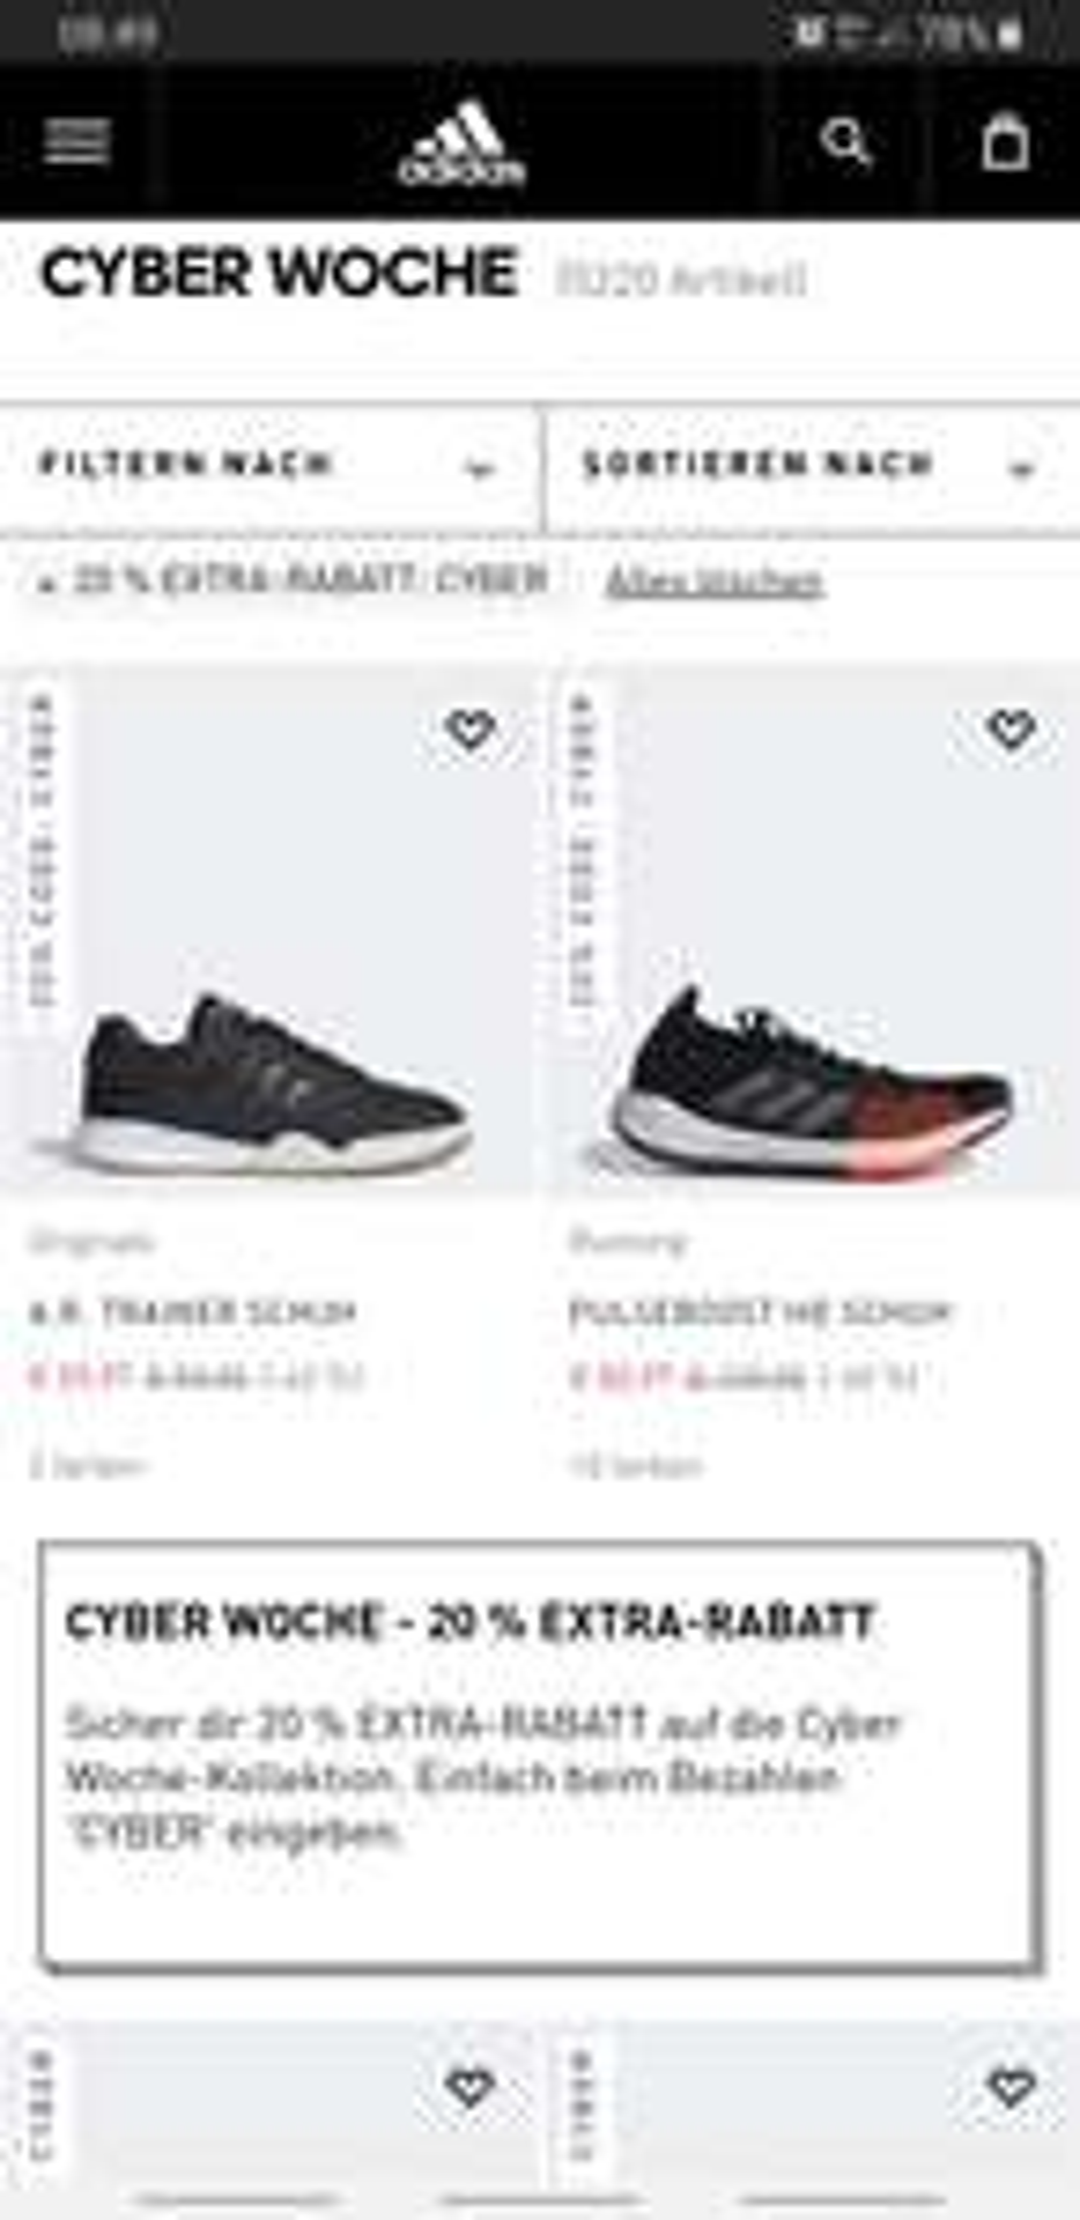 Cyber Woche Adidas -20% Extra Rabatt